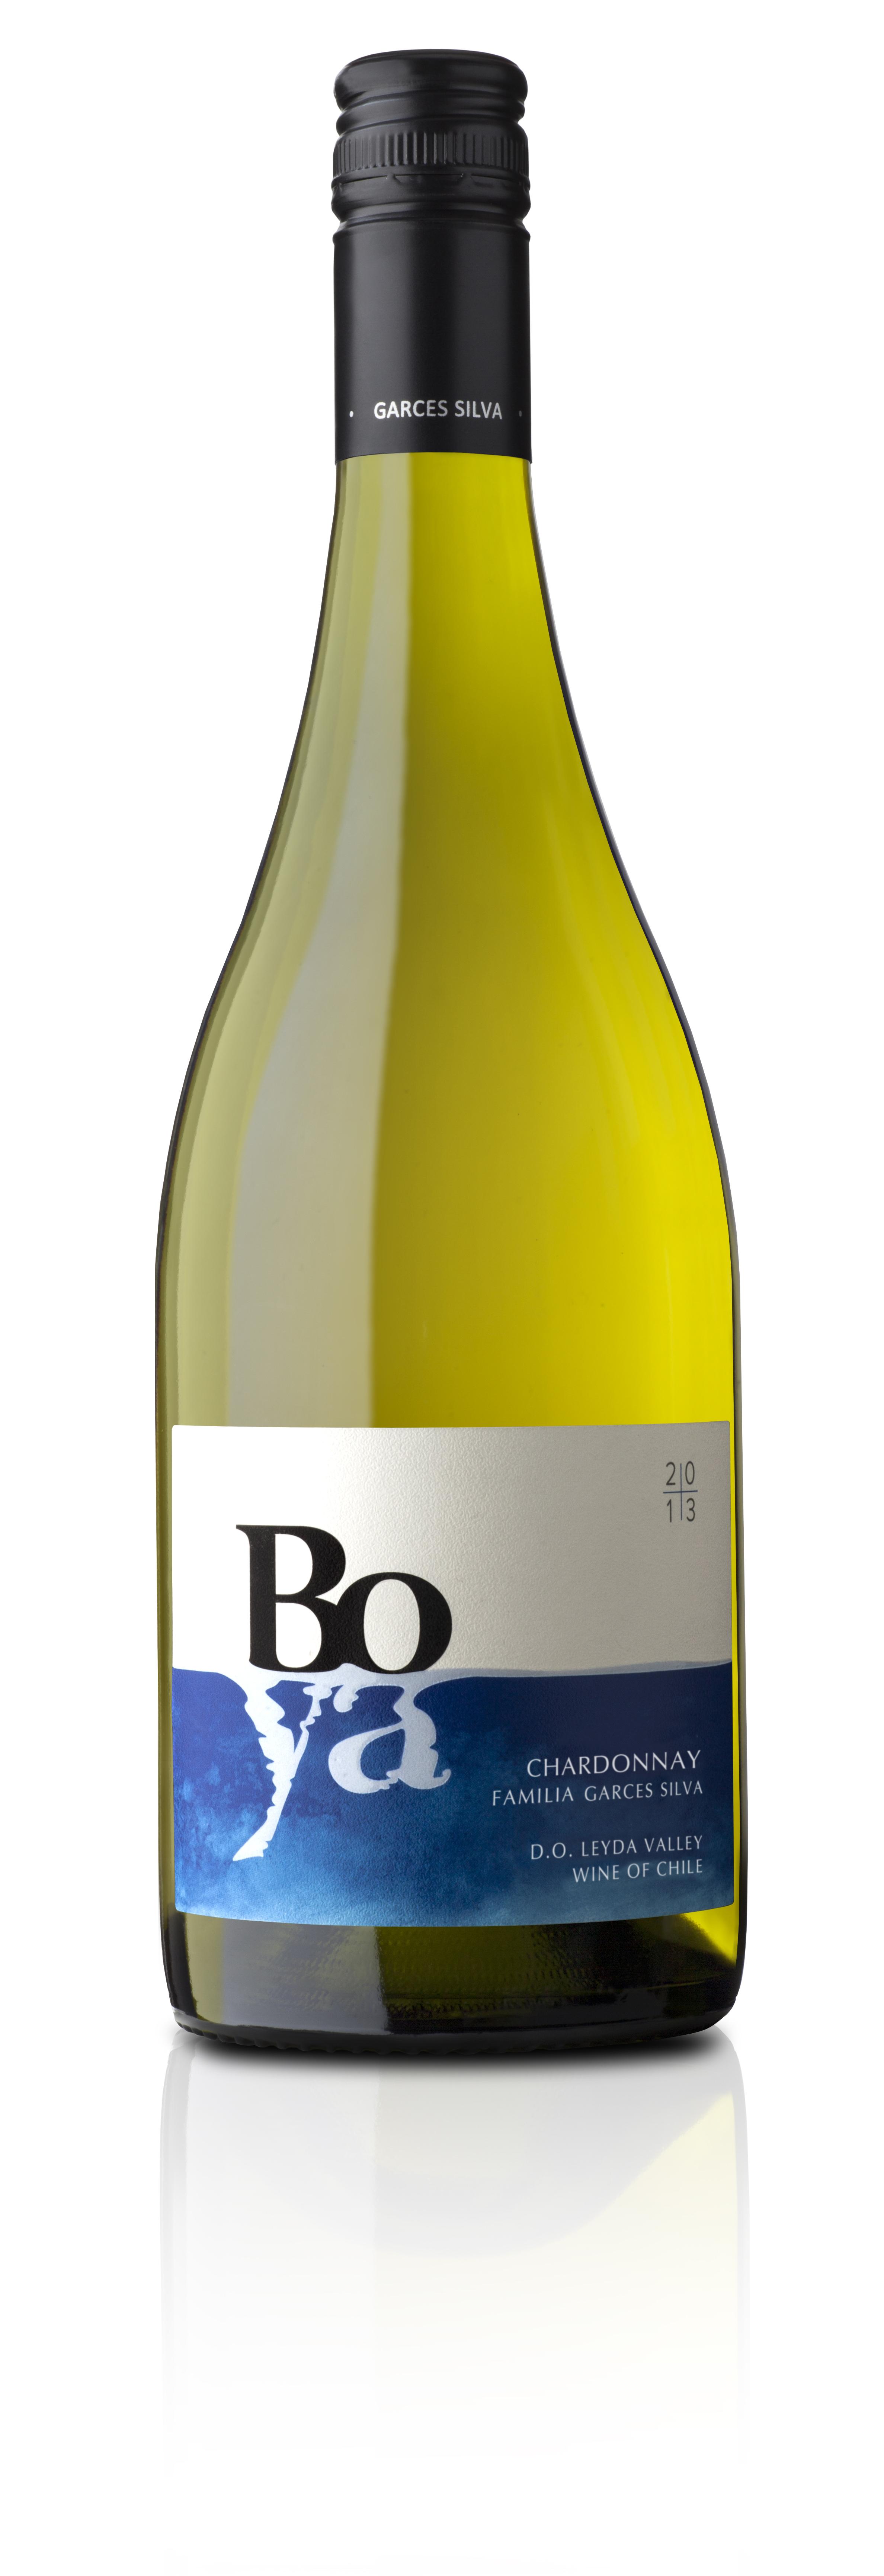 Boya_Bottled_CH13.jpg